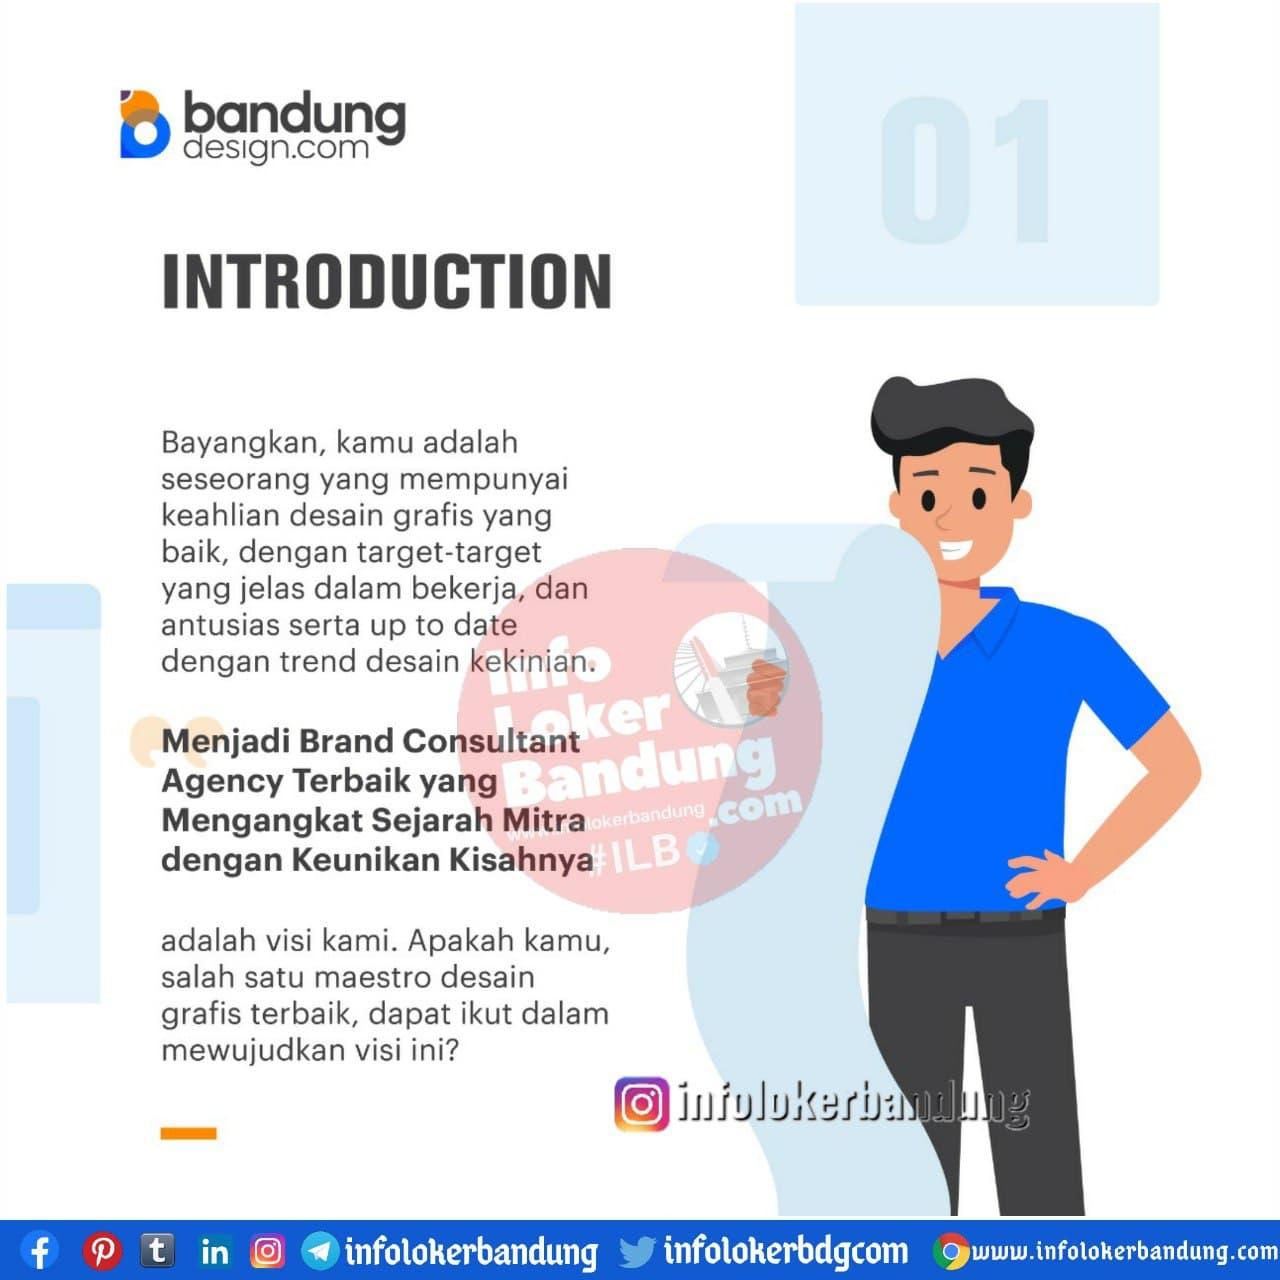 Lowongan Kerja Bandung Design Desember 2020